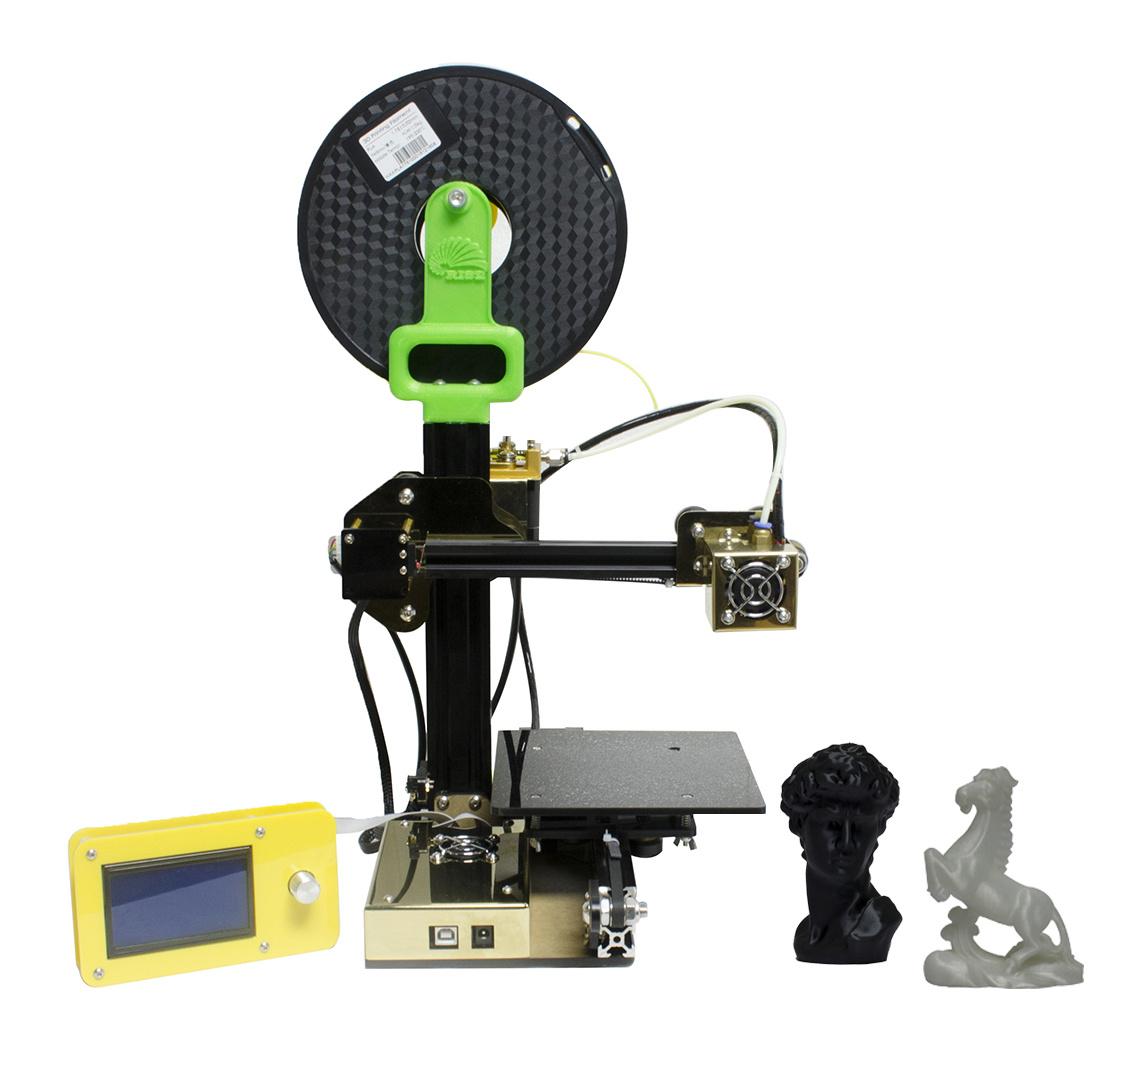 Rise High Precision Aluminum Digital Fdm Desktop DIY 3D Printing